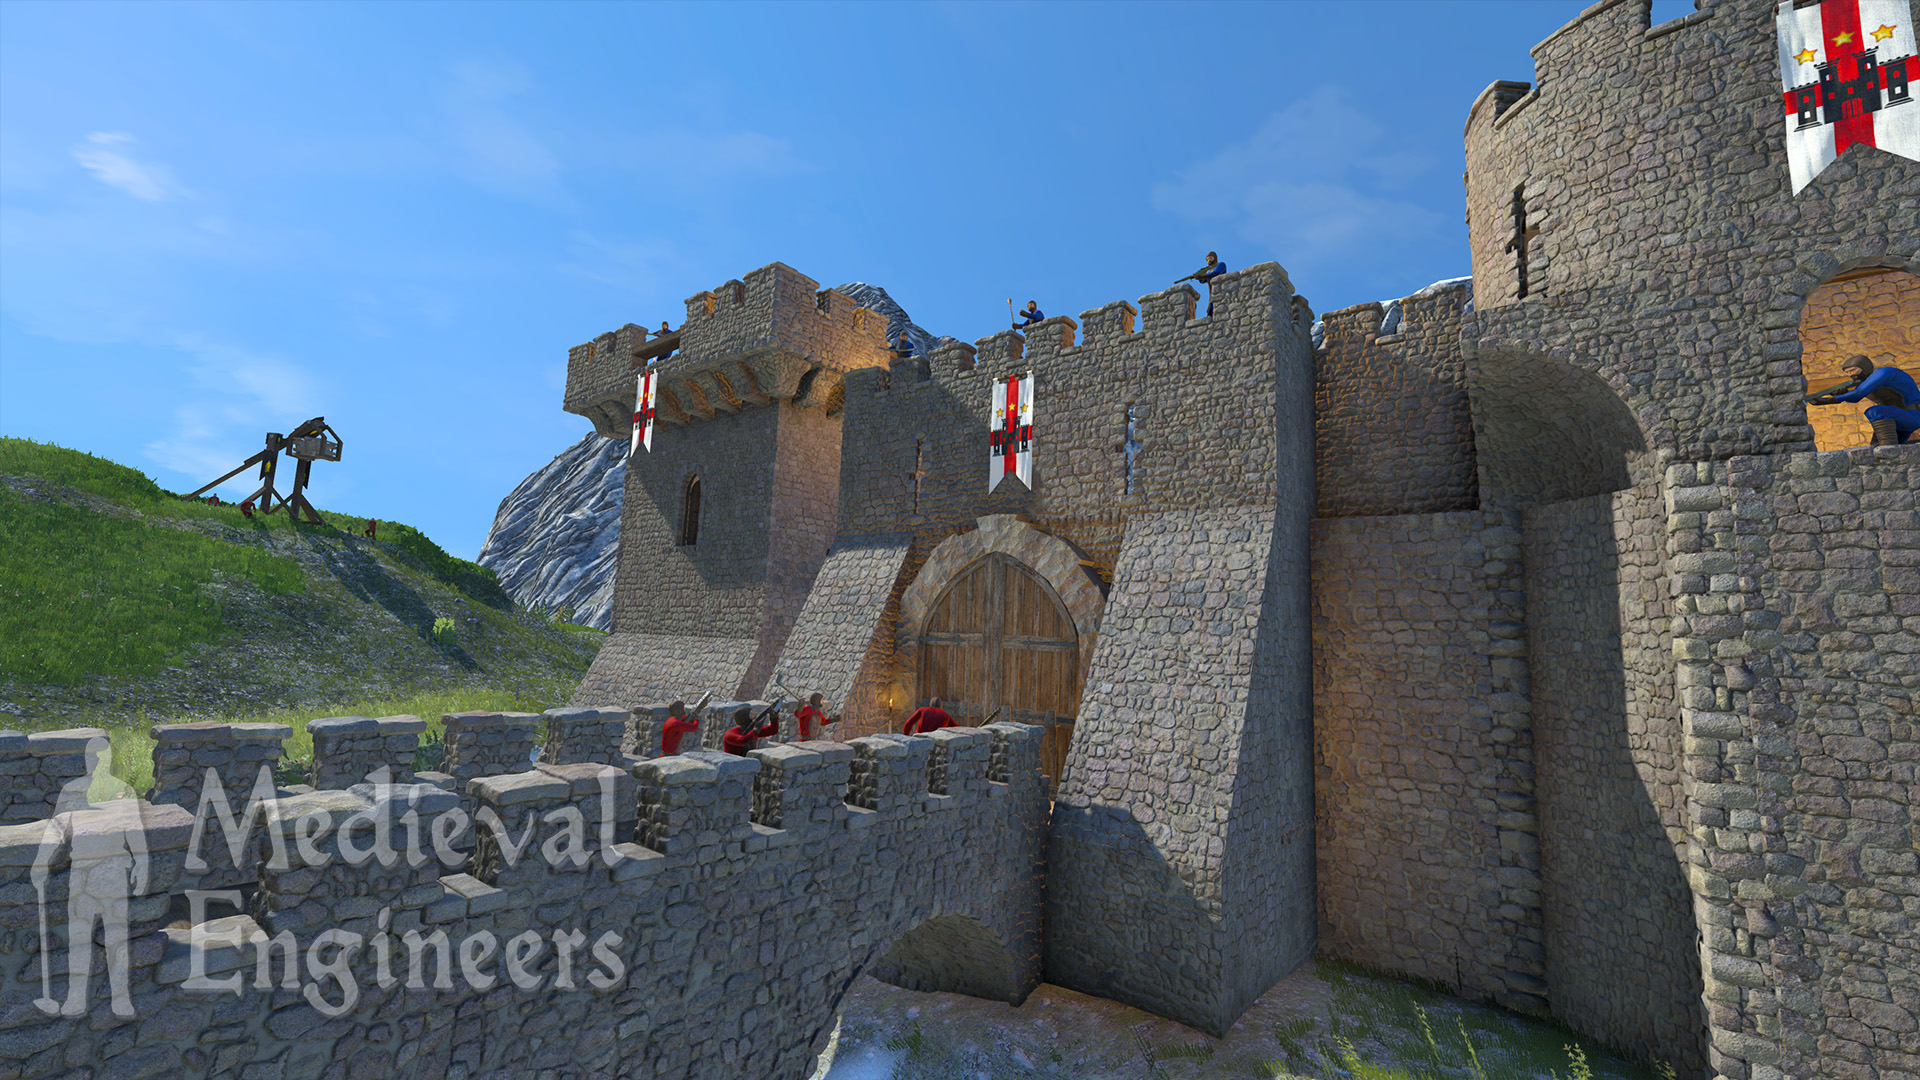 FEATURES – Medieval Engineers